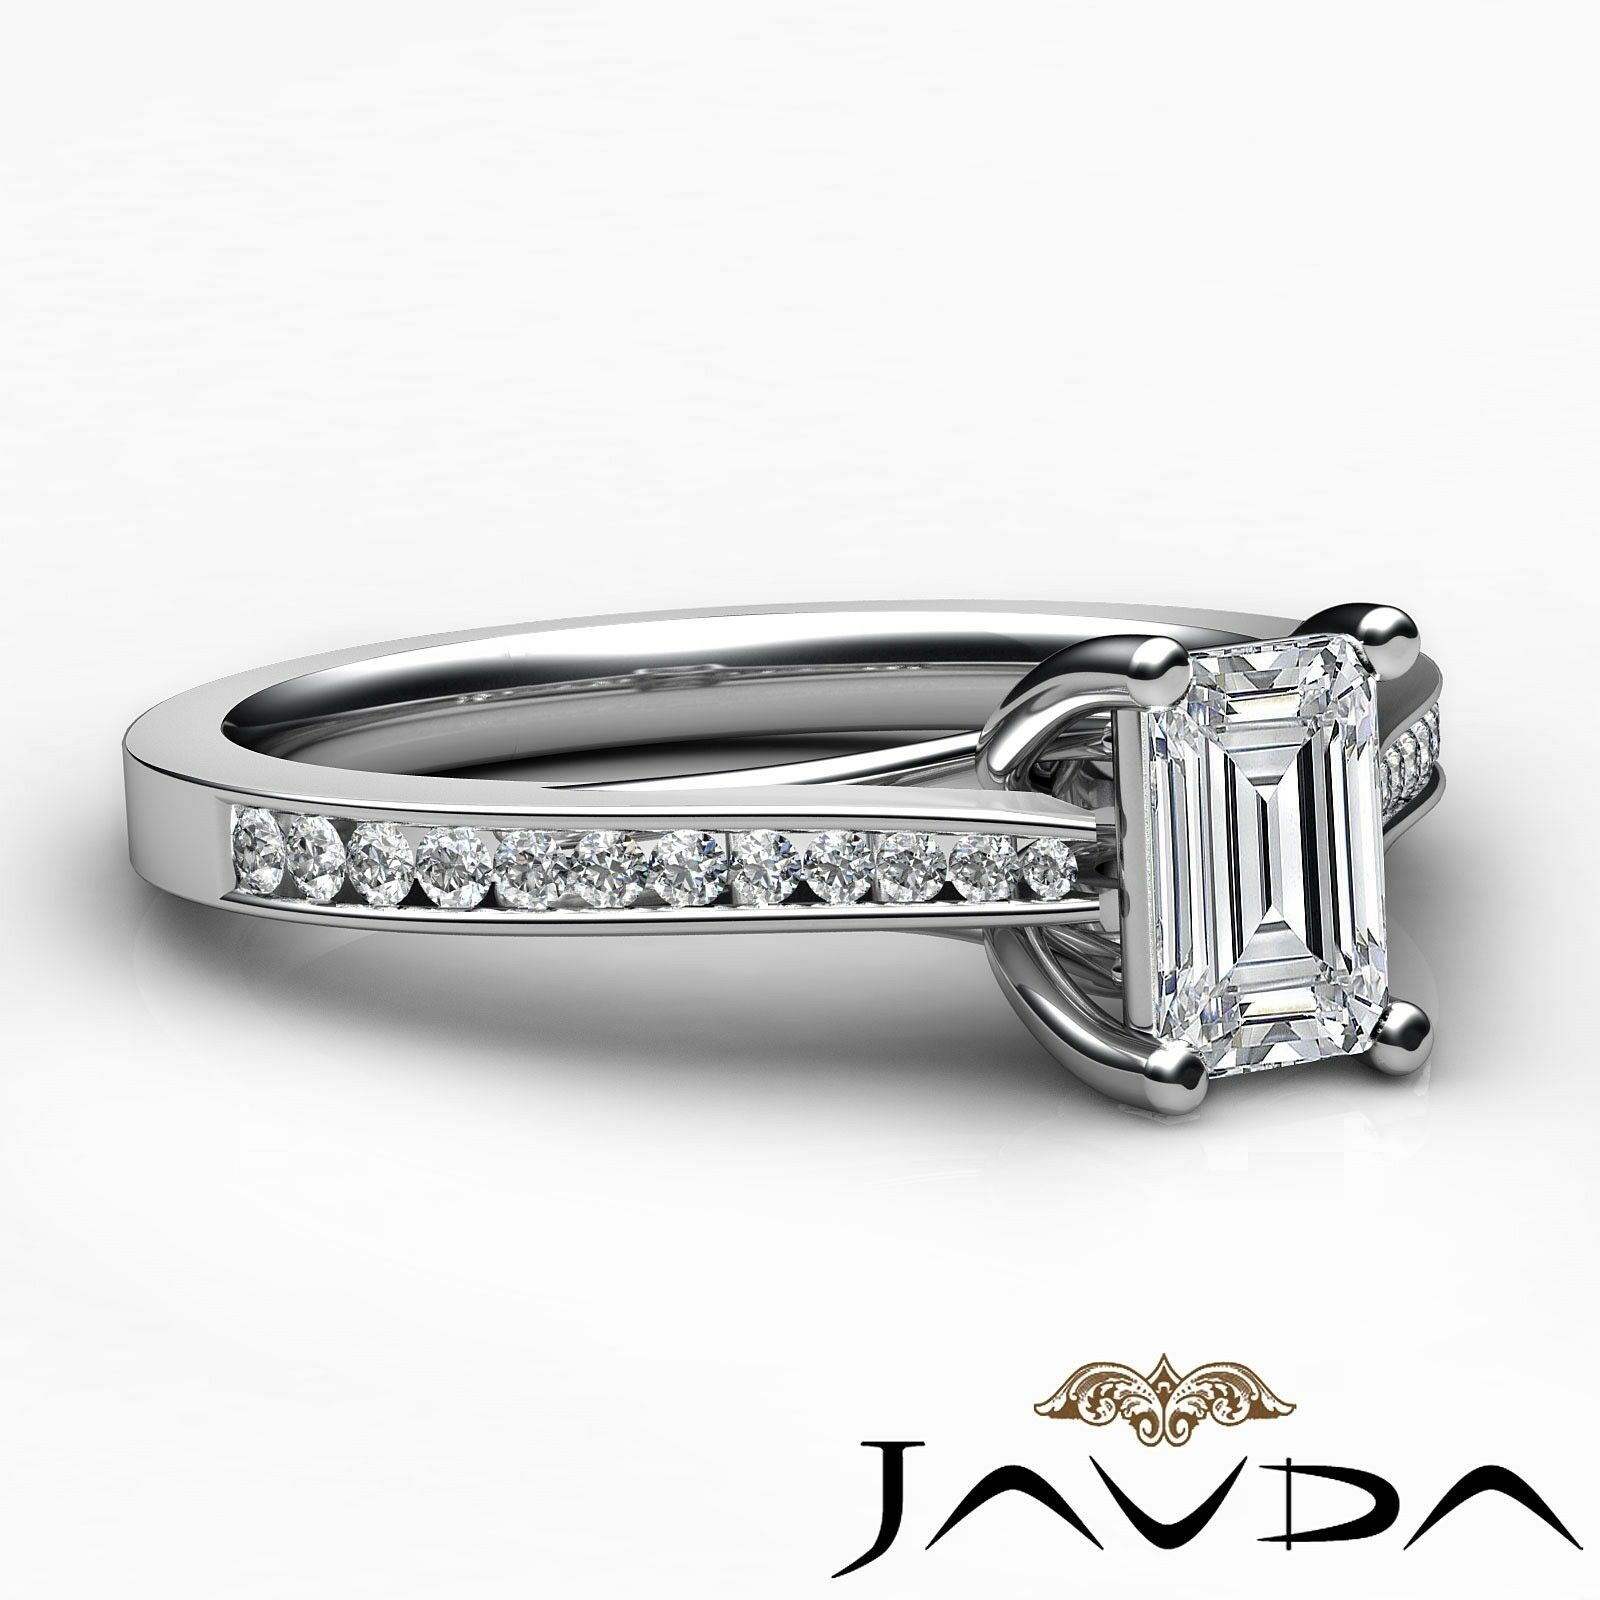 1.32ctw Channel Set Shank Emerald Diamond Engagement Ring GIA F-VVS2 White Gold 5